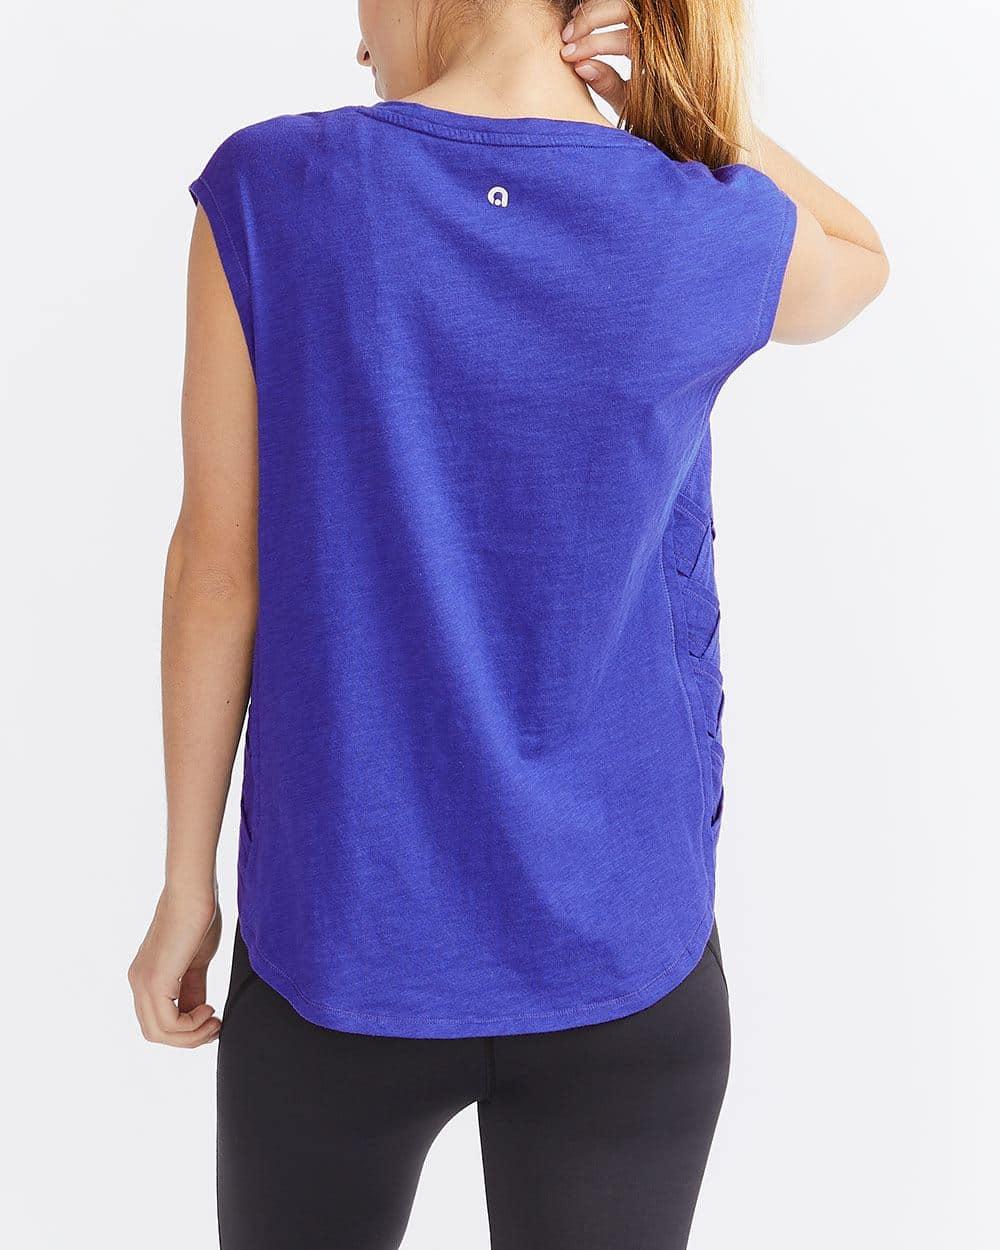 Hyba Braided T-Shirt